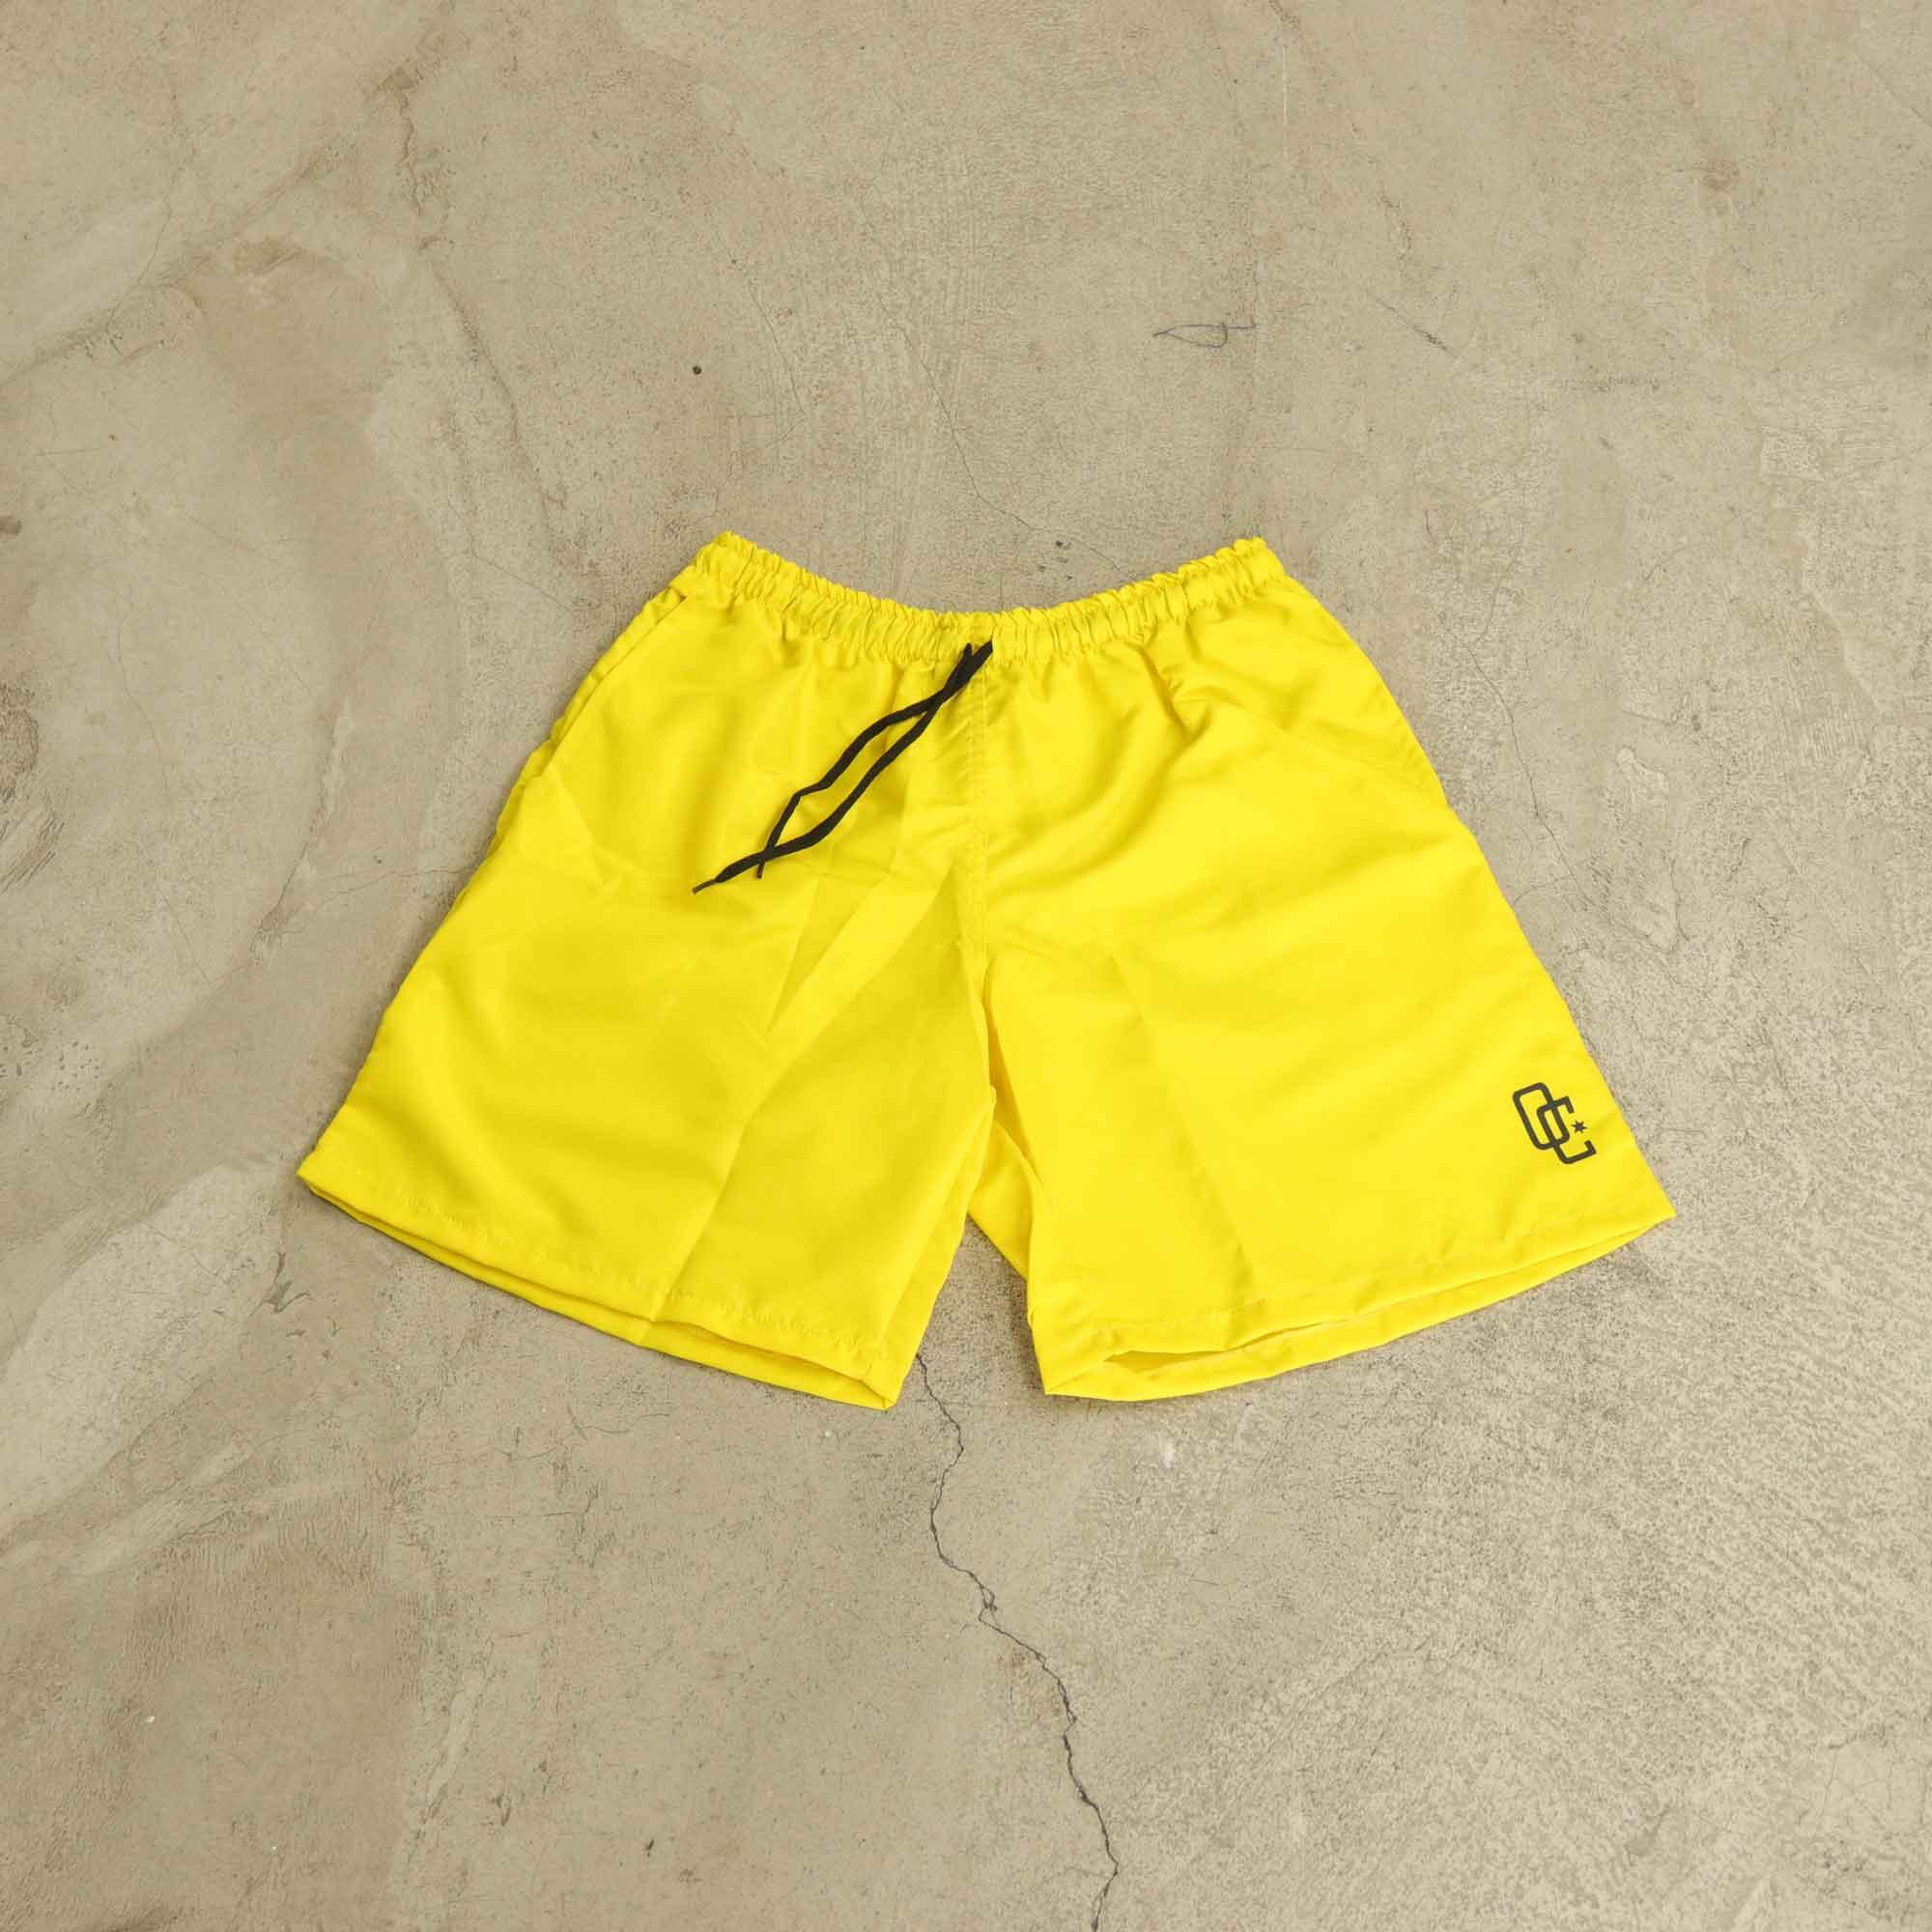 Swimming Shorts Overcome